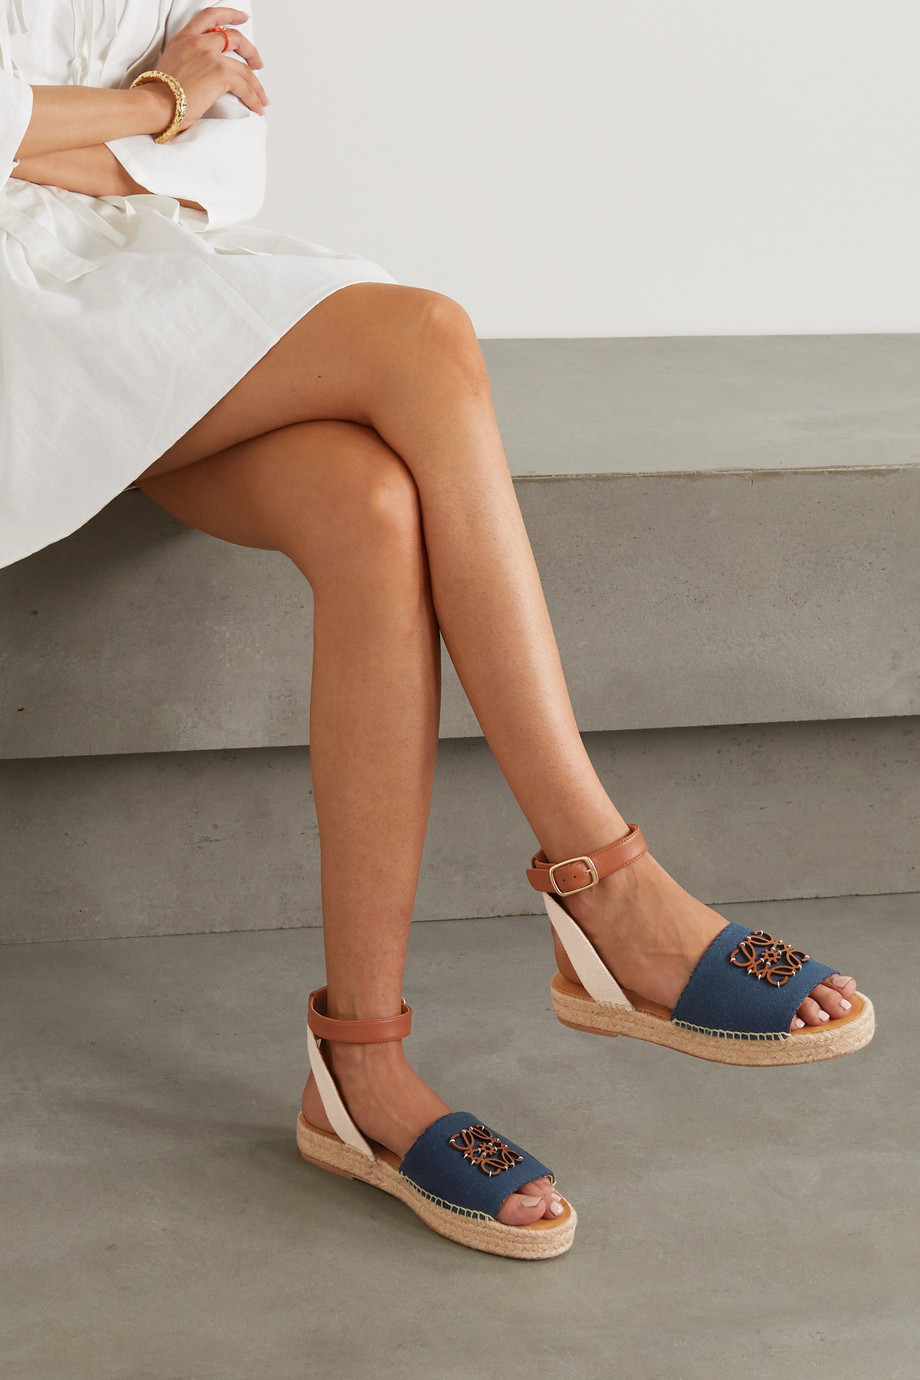 Loewe + Paula's Ibiza canvas and leather espadrille sandals